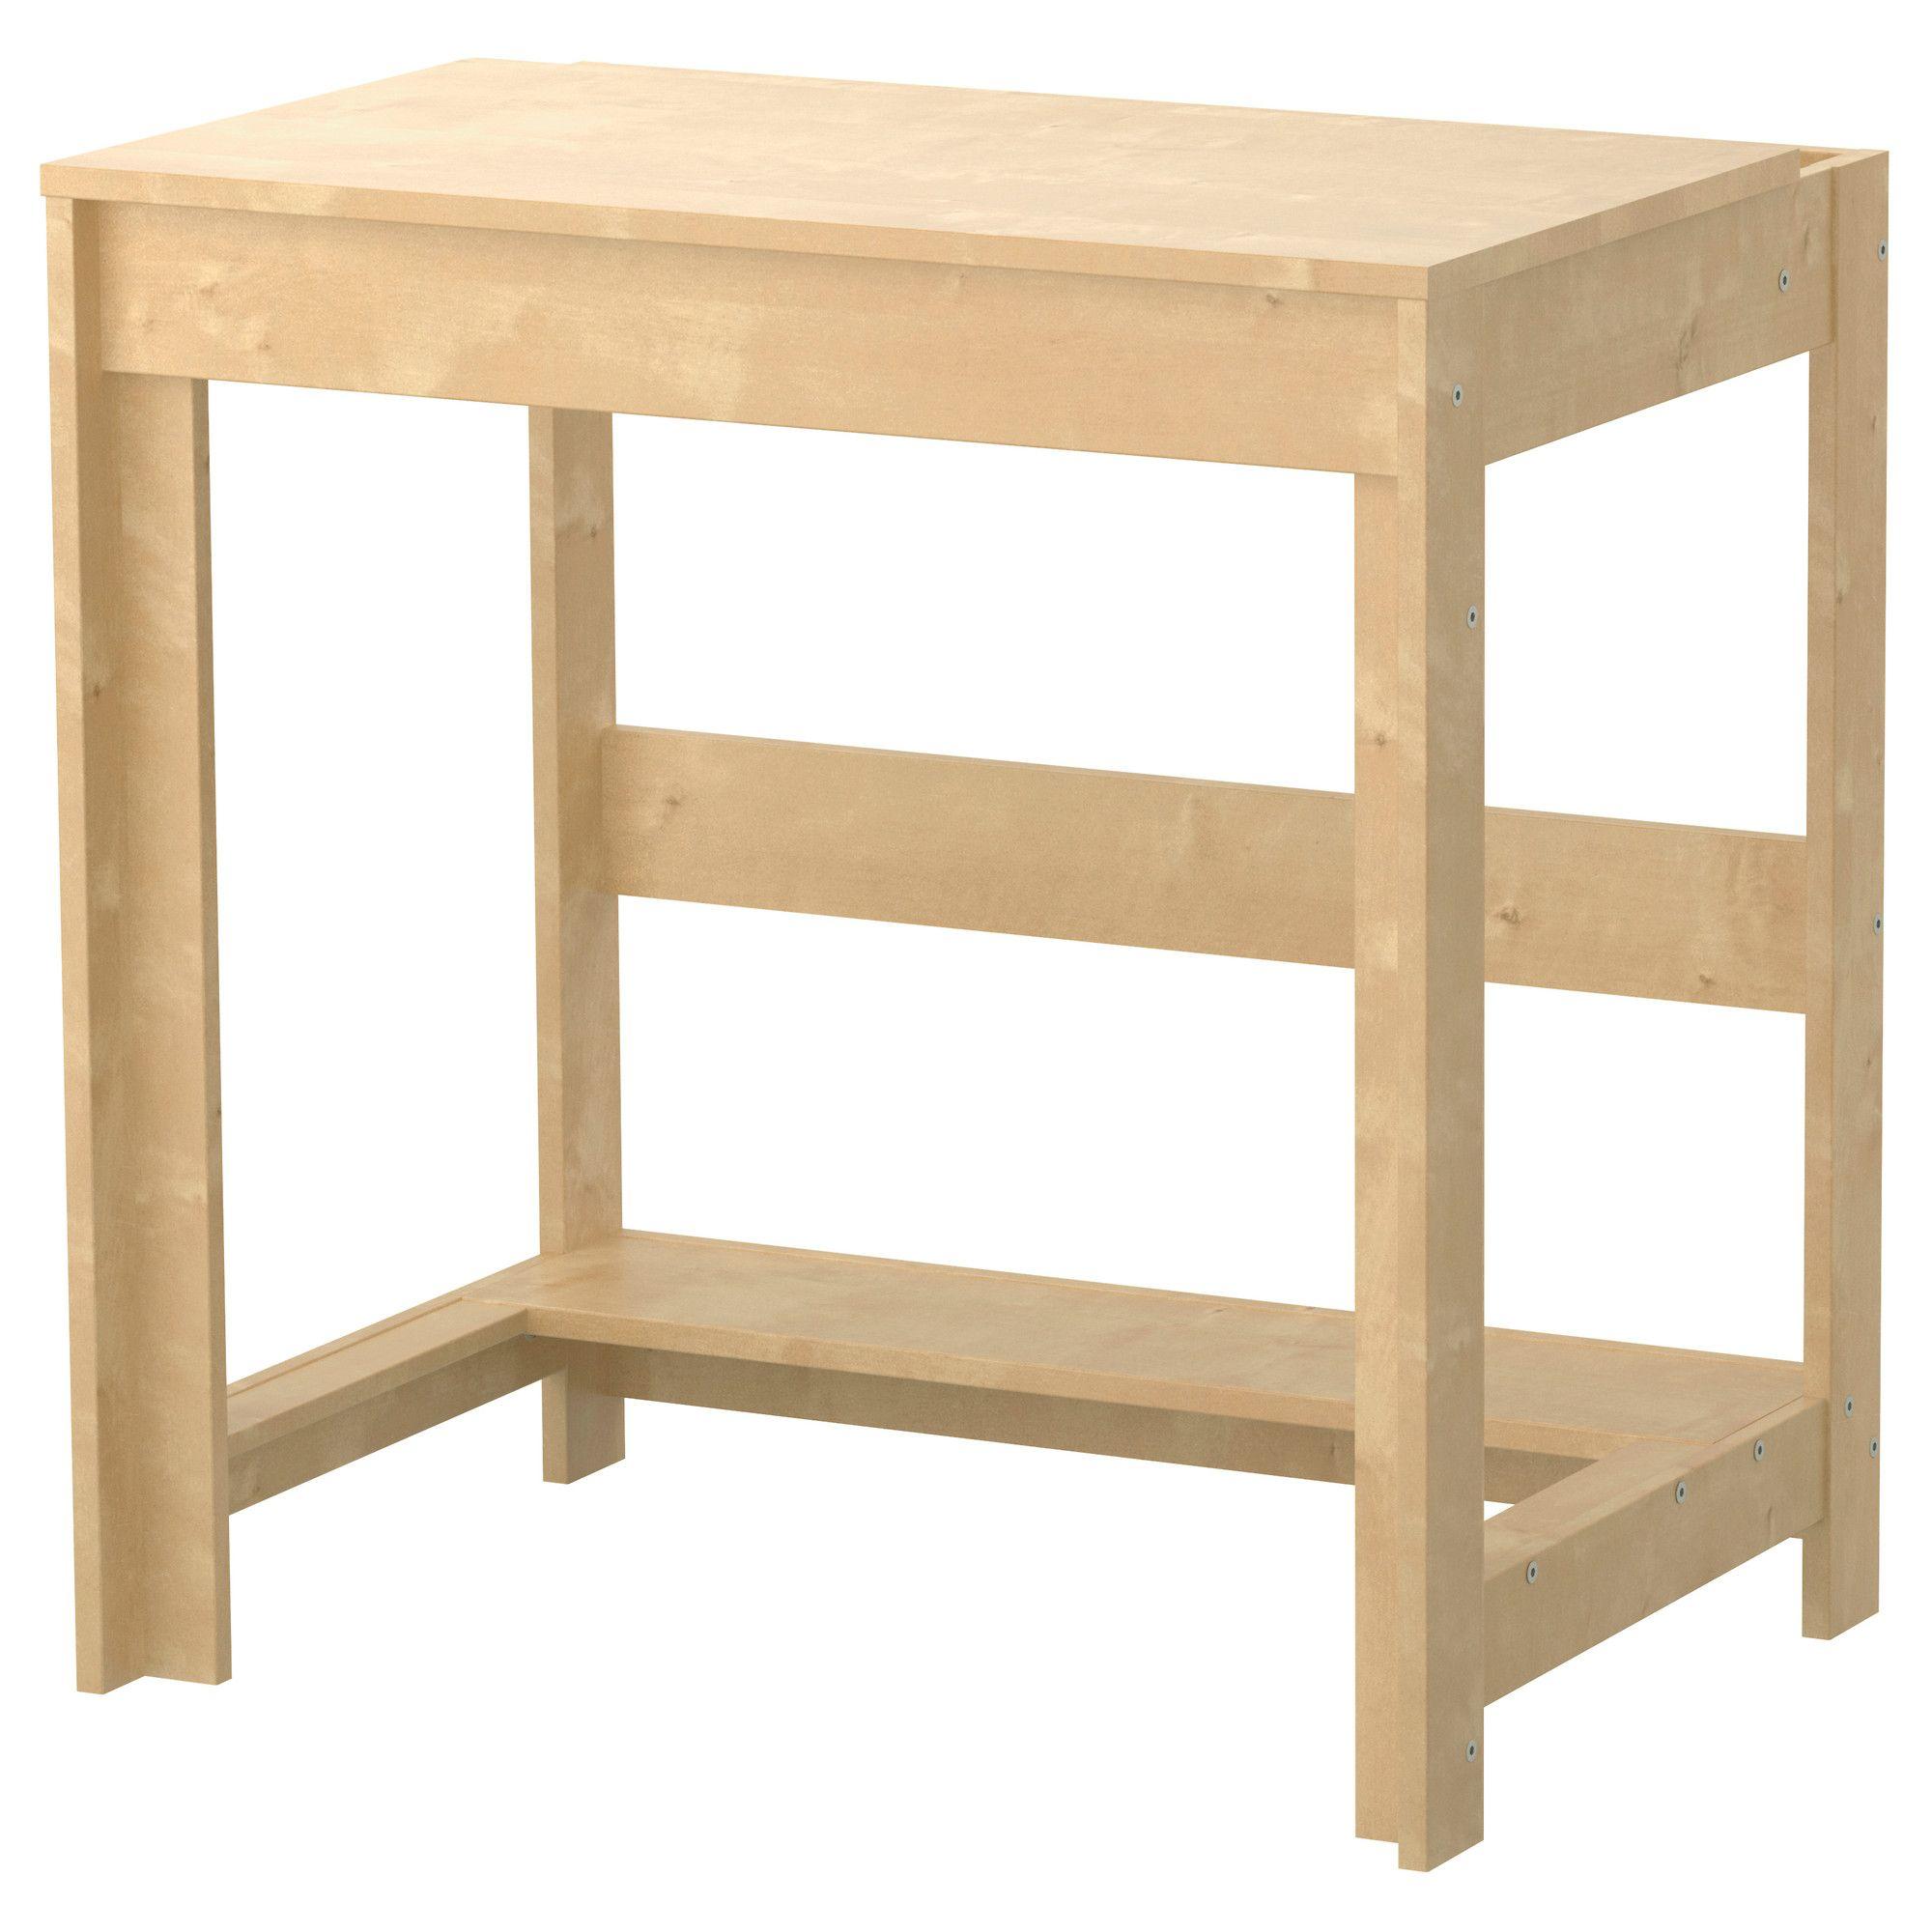 Buy Furniture Malaysia Online Ikea desk, Ikea built in